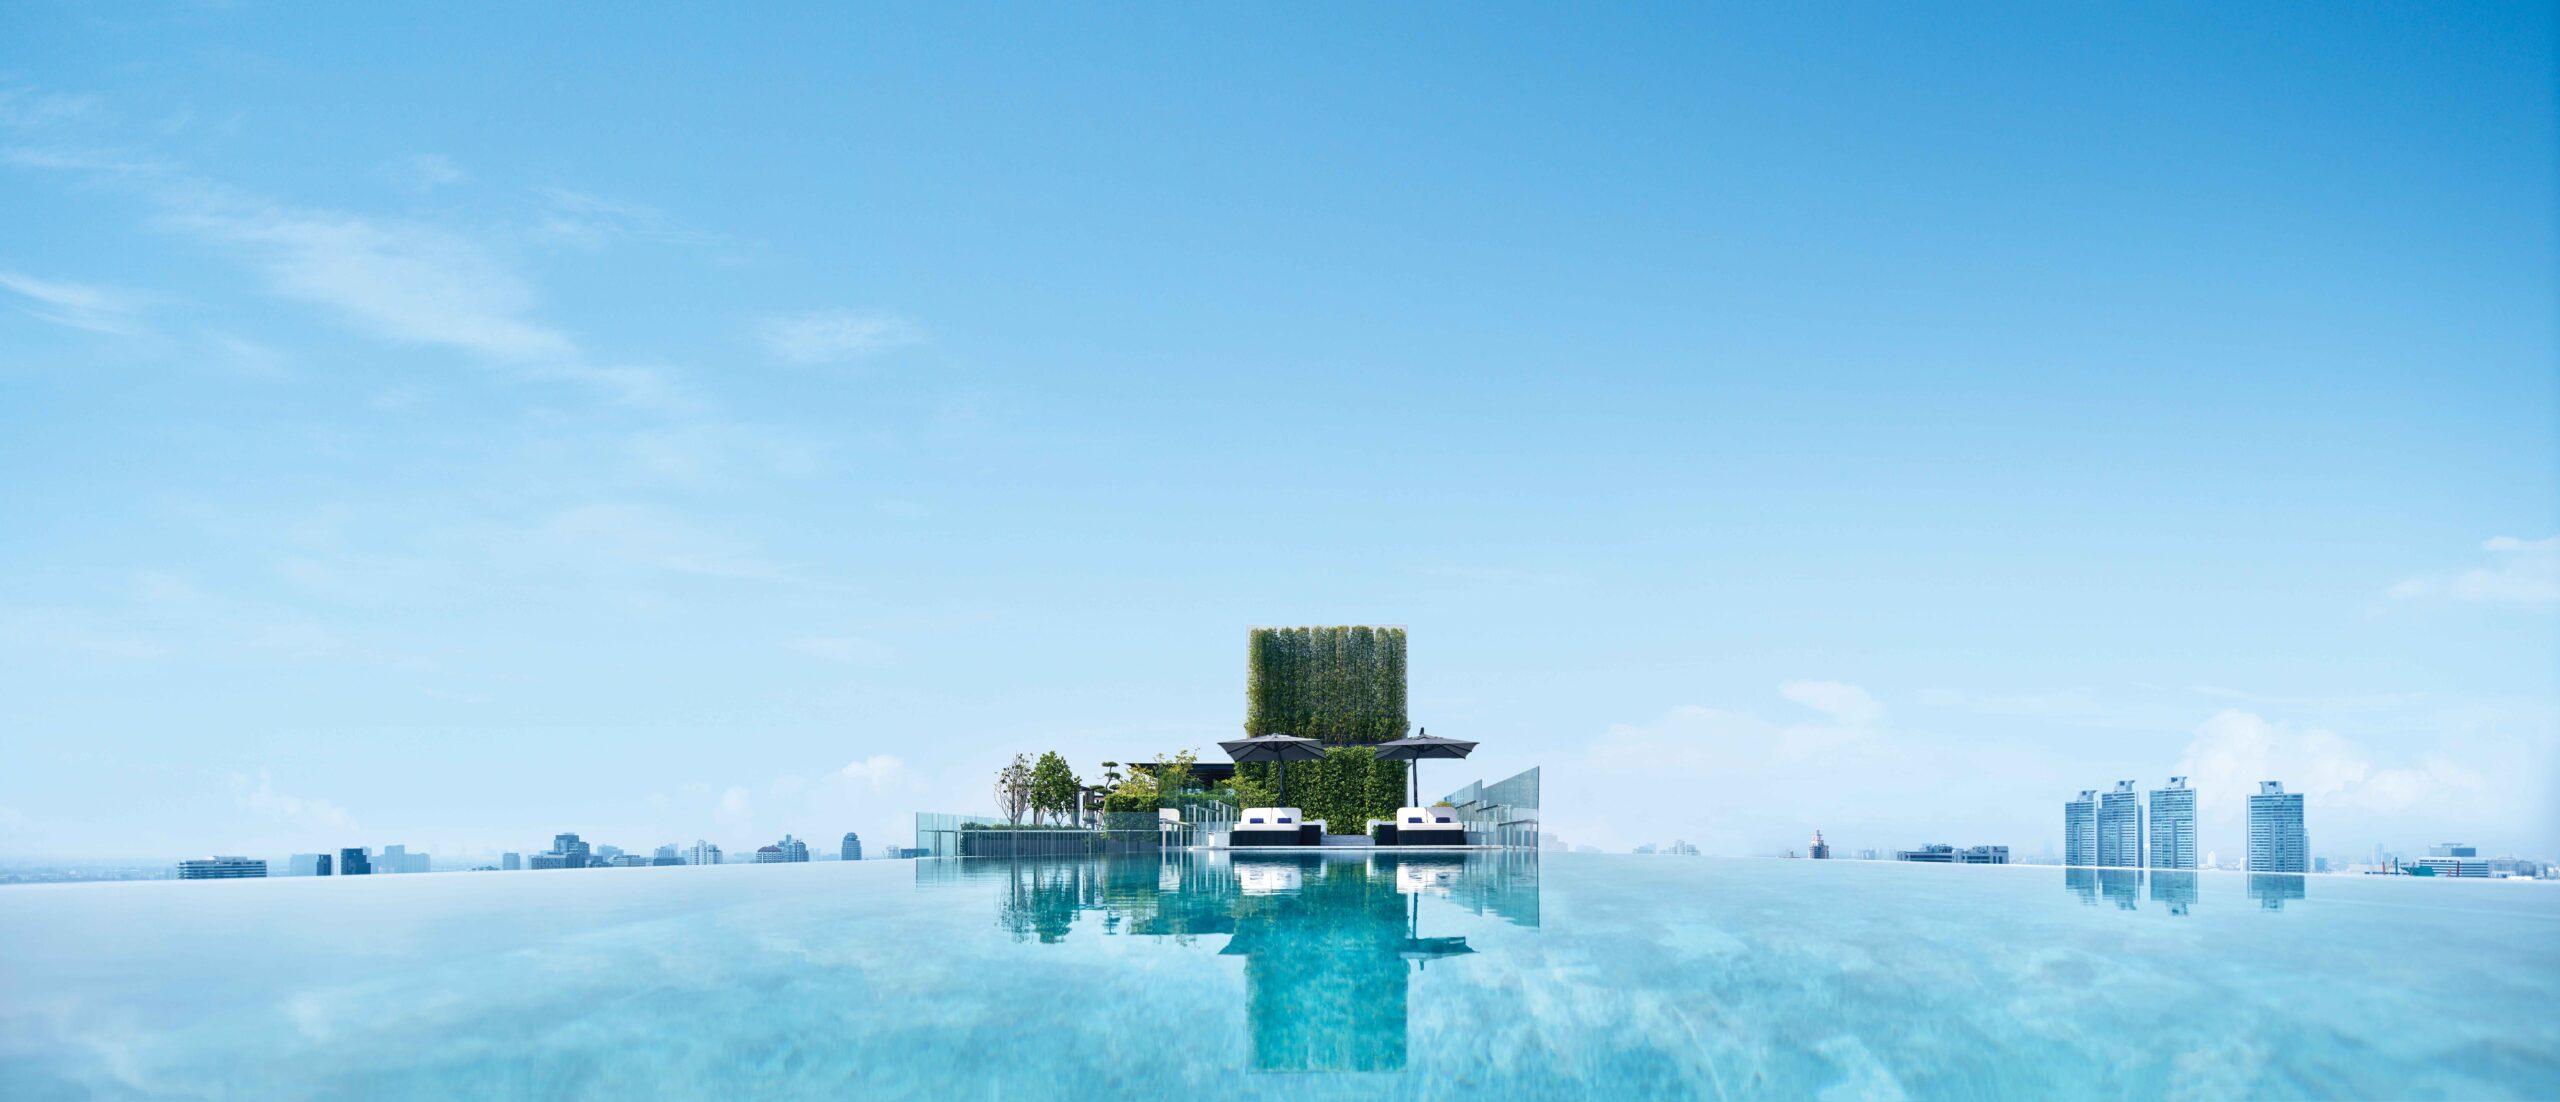 137-pillars-suites-and-residences-bangkok-thailand